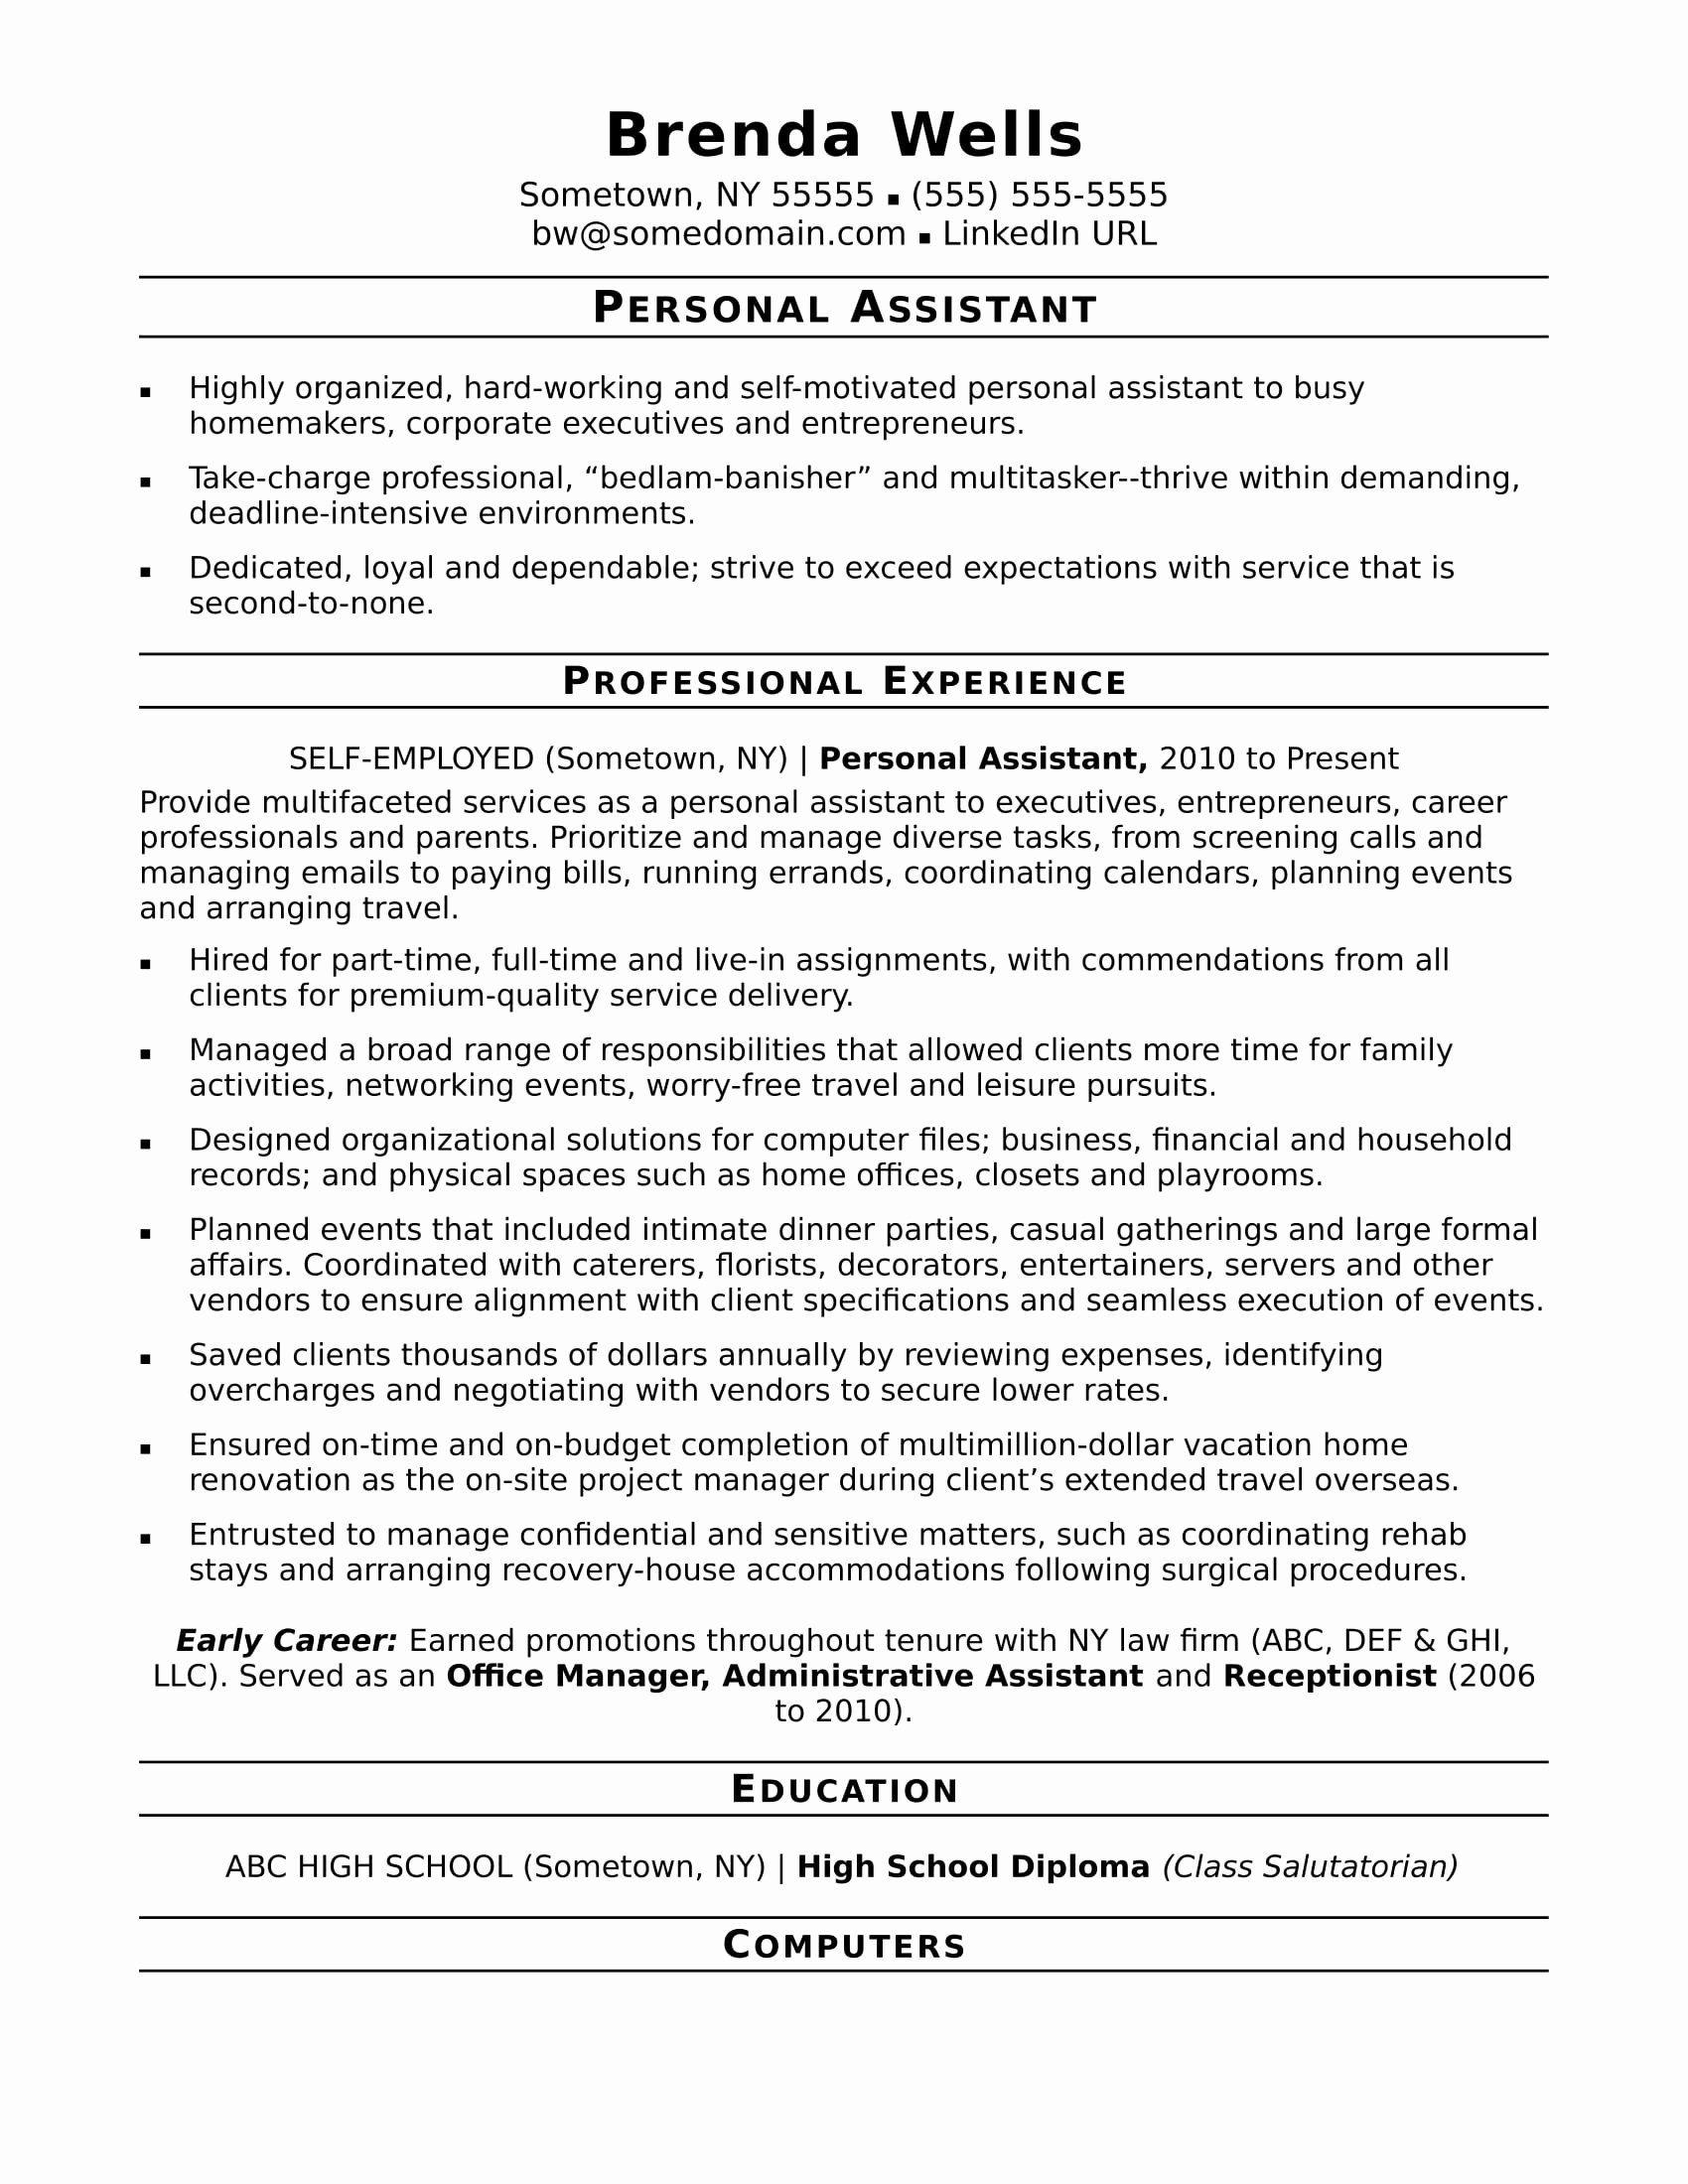 Concierge Job Description Resume Fresh Personal Assistant Resume Sample